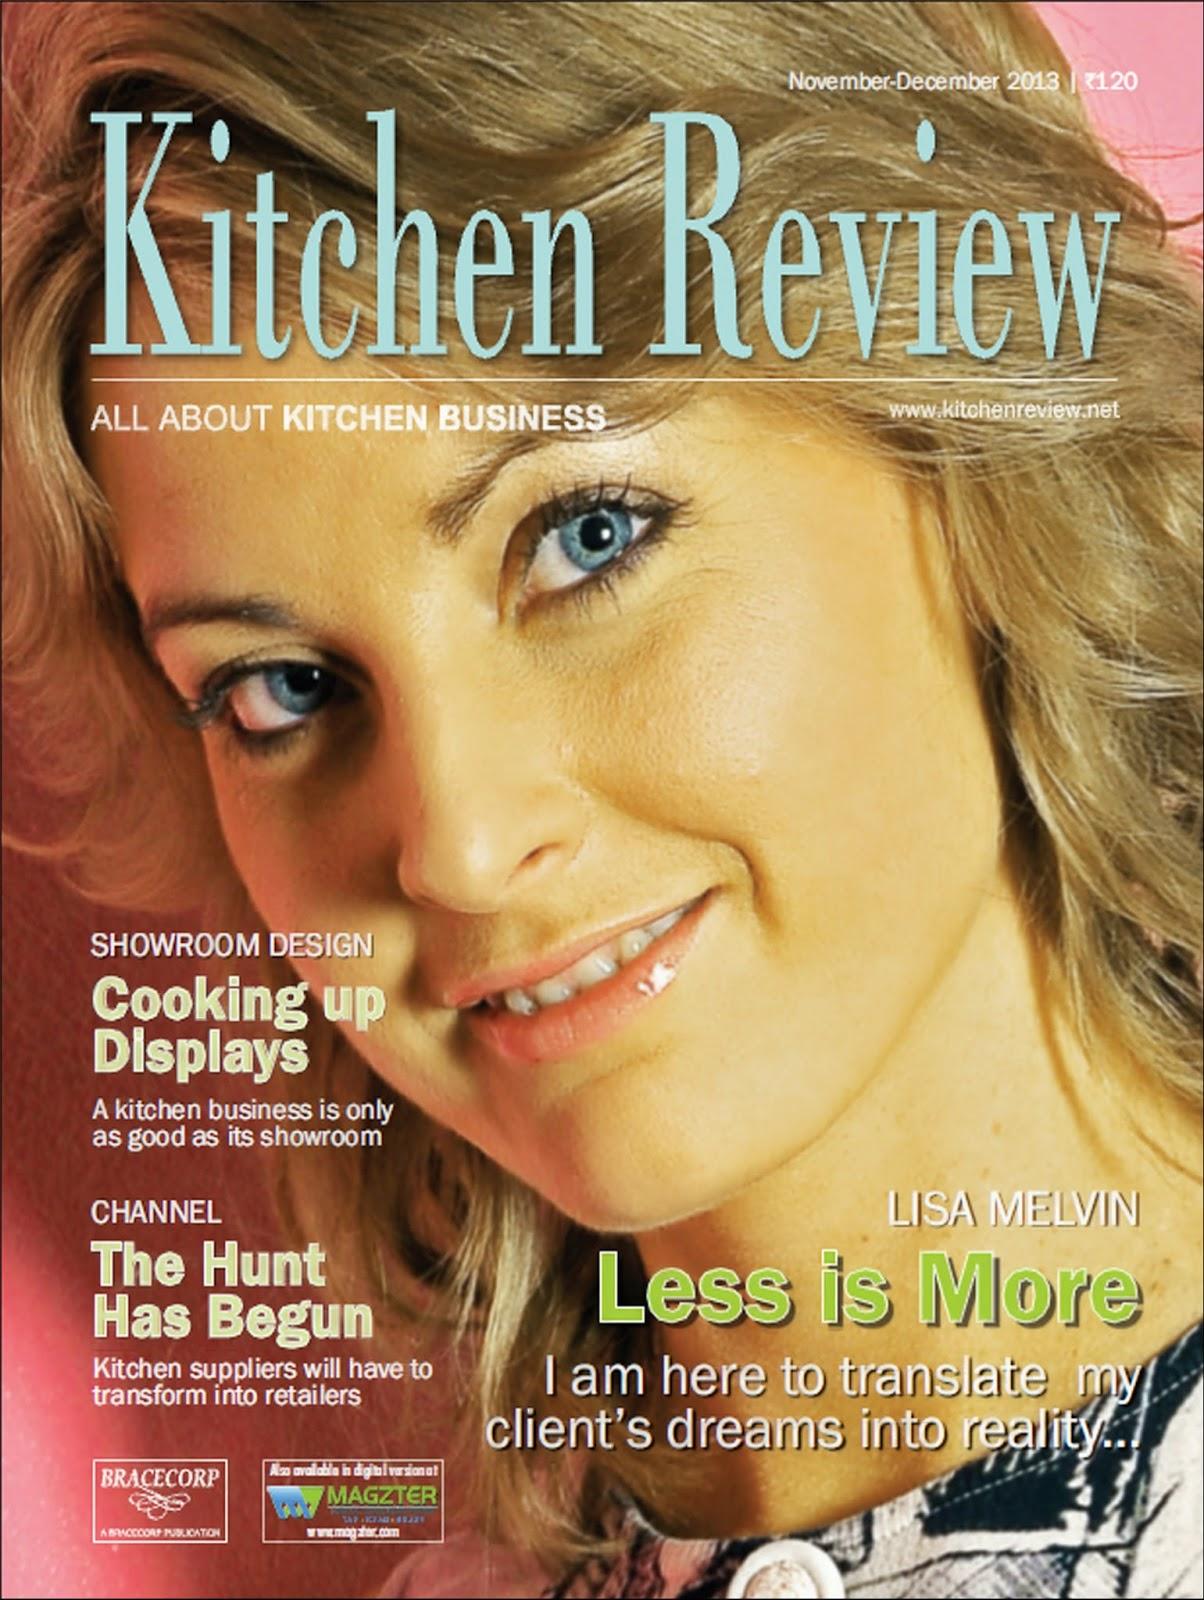 Lisa Melvin Cover Story